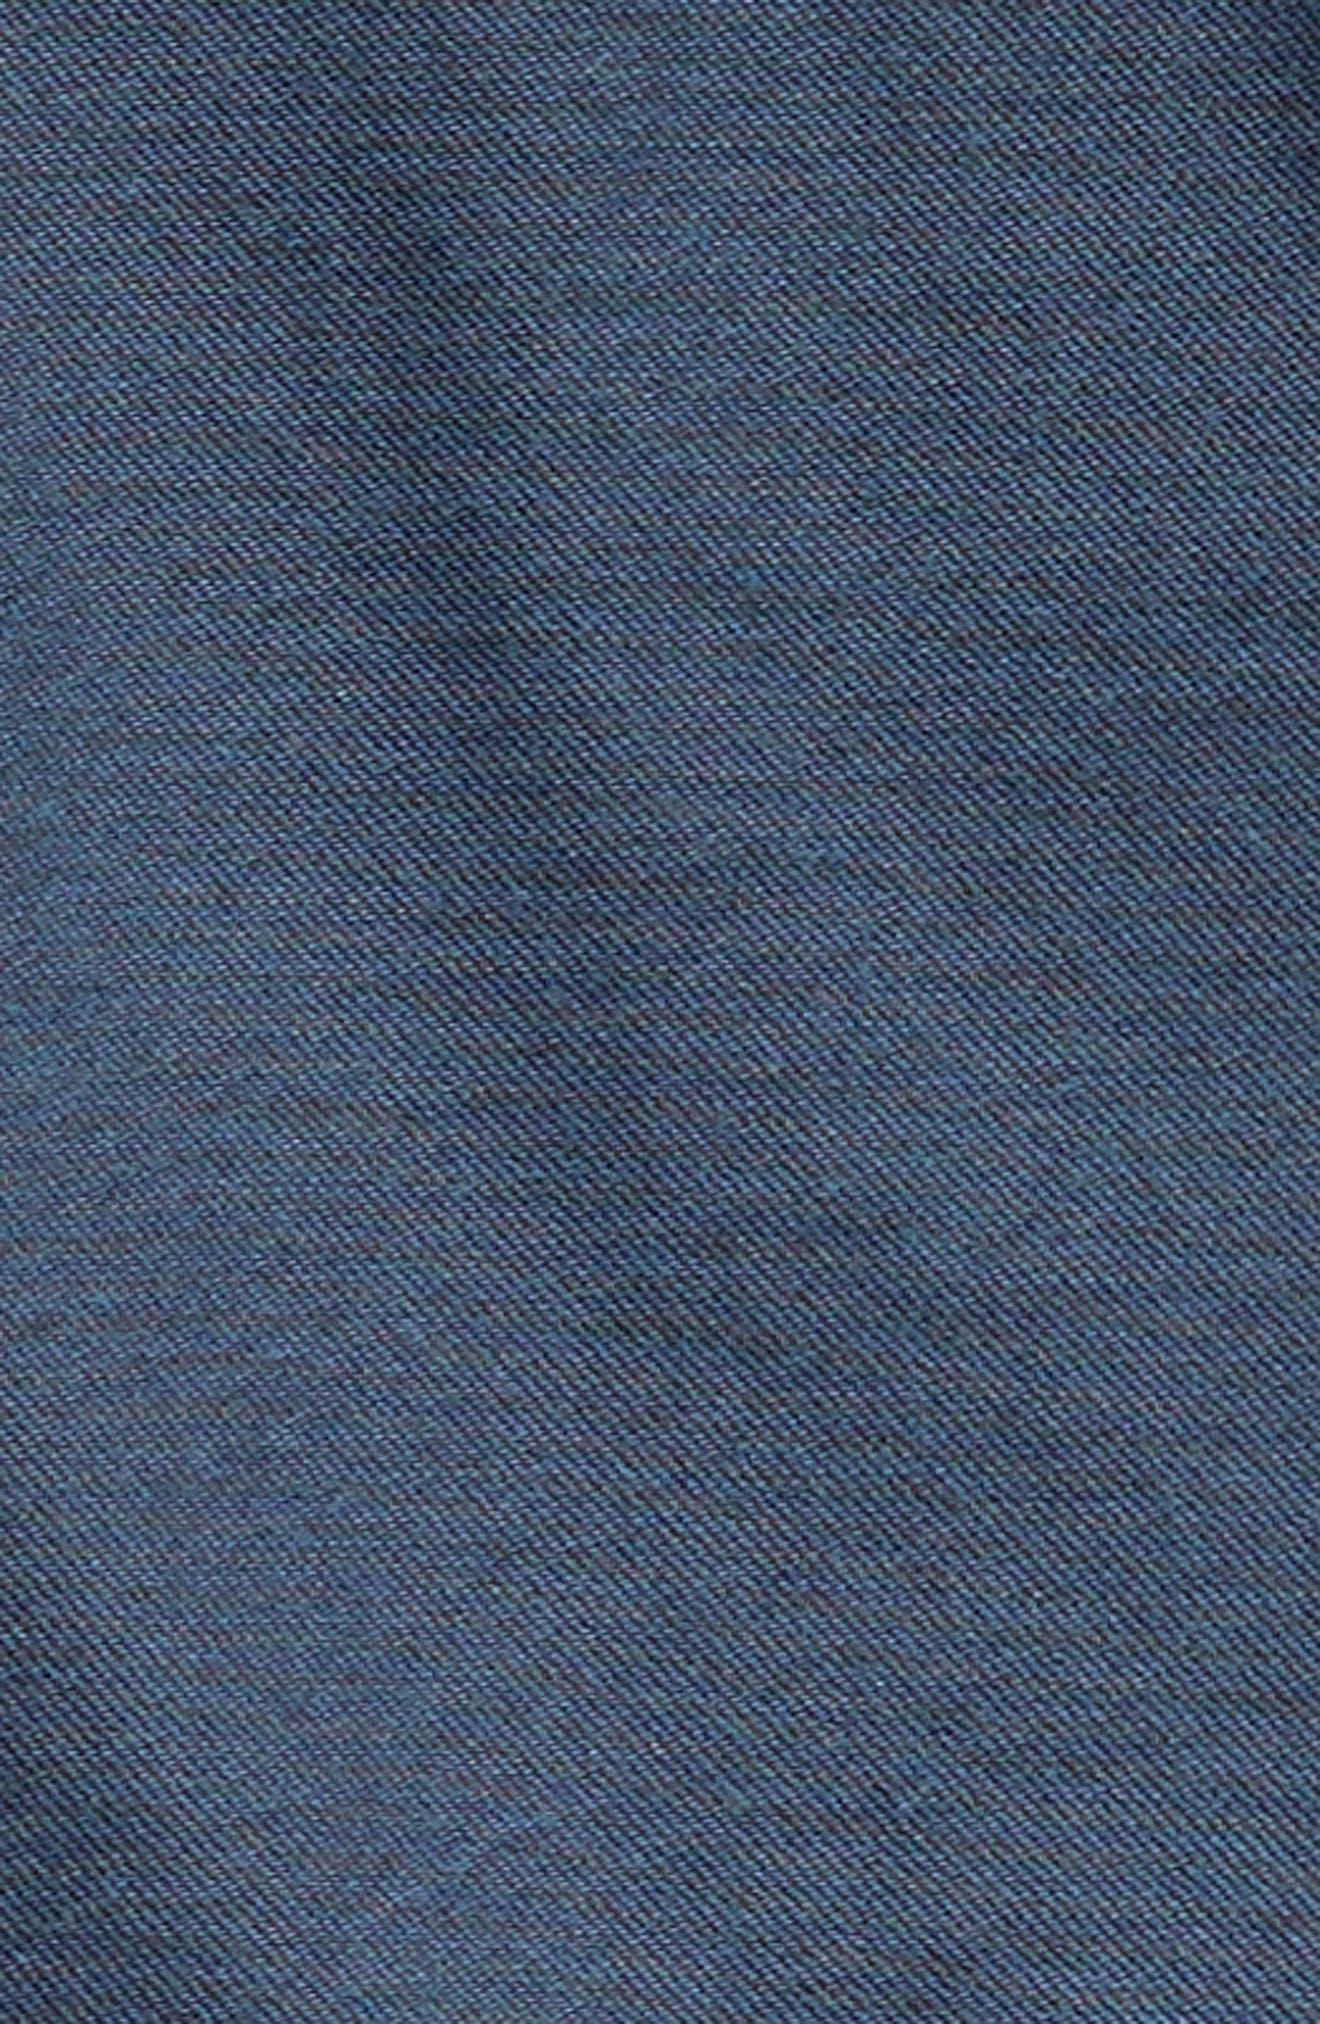 Scranton Chino Shorts,                             Alternate thumbnail 3, color,                             Slate